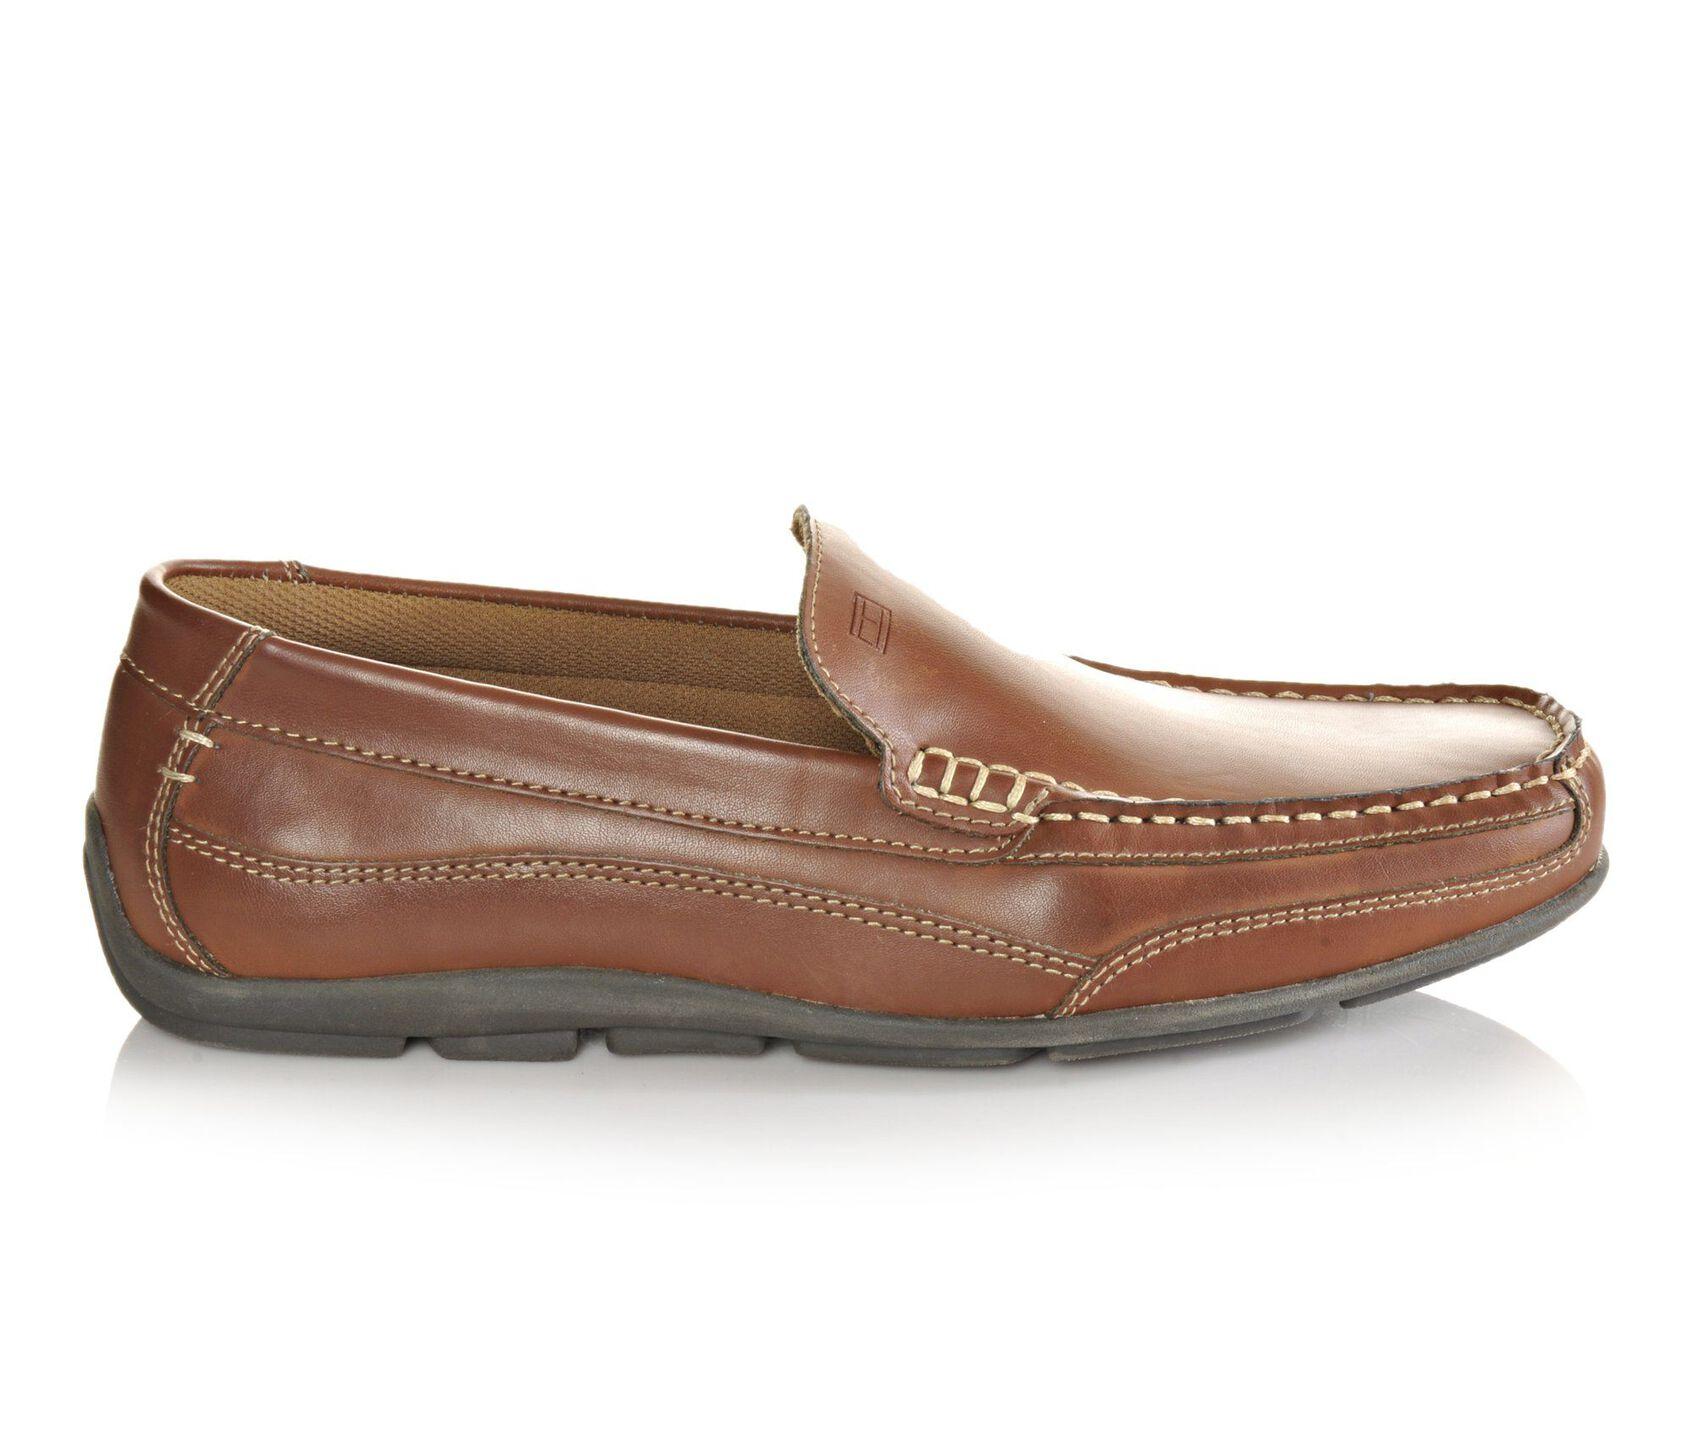 d7f05d77254f0a Men's Tommy Hilfiger Dathan Loafers | Shoe Carnival